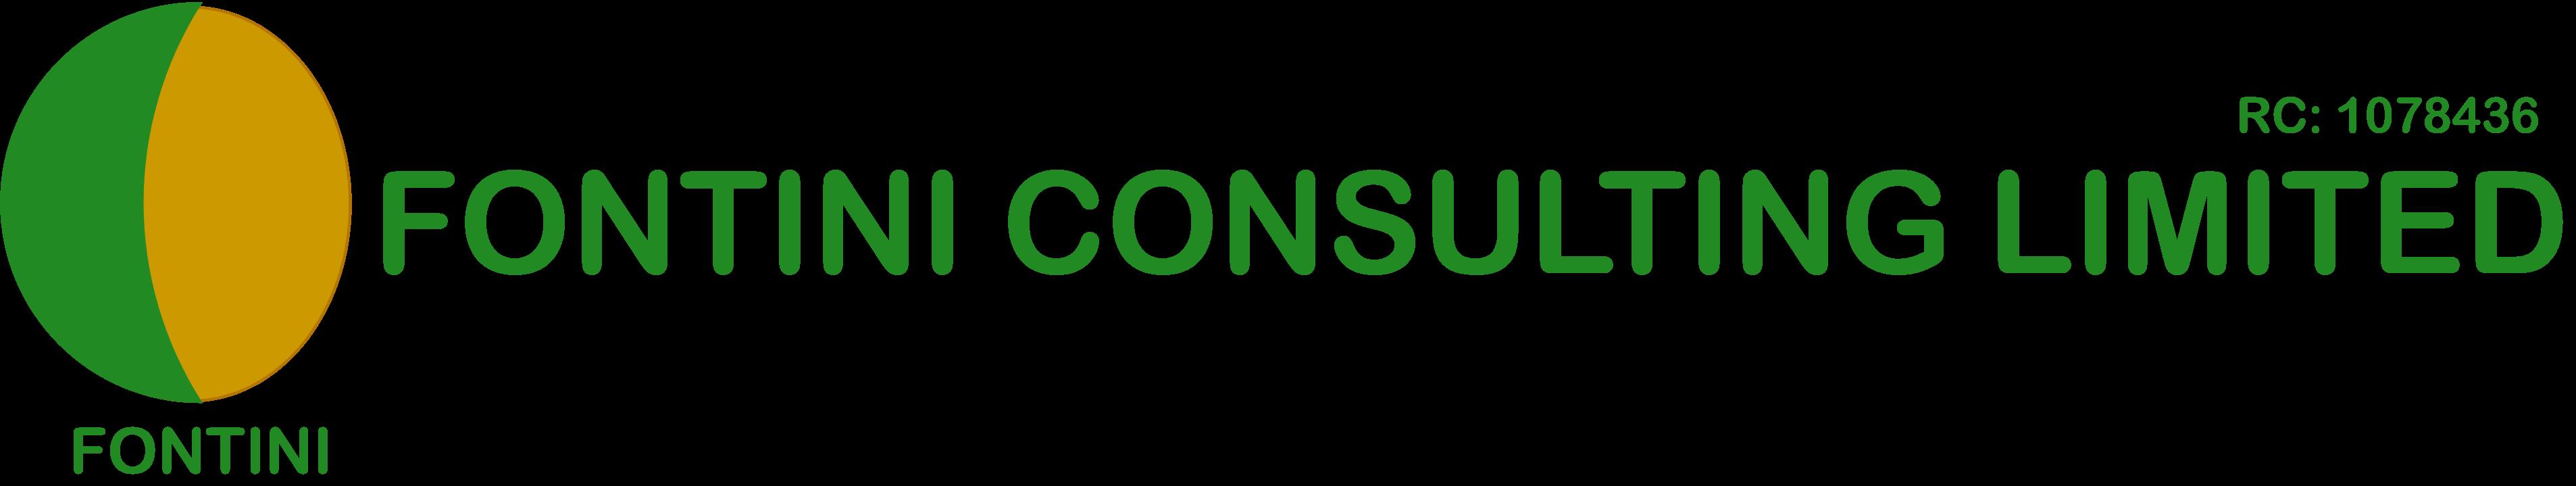 Fontini Consulting Ltd